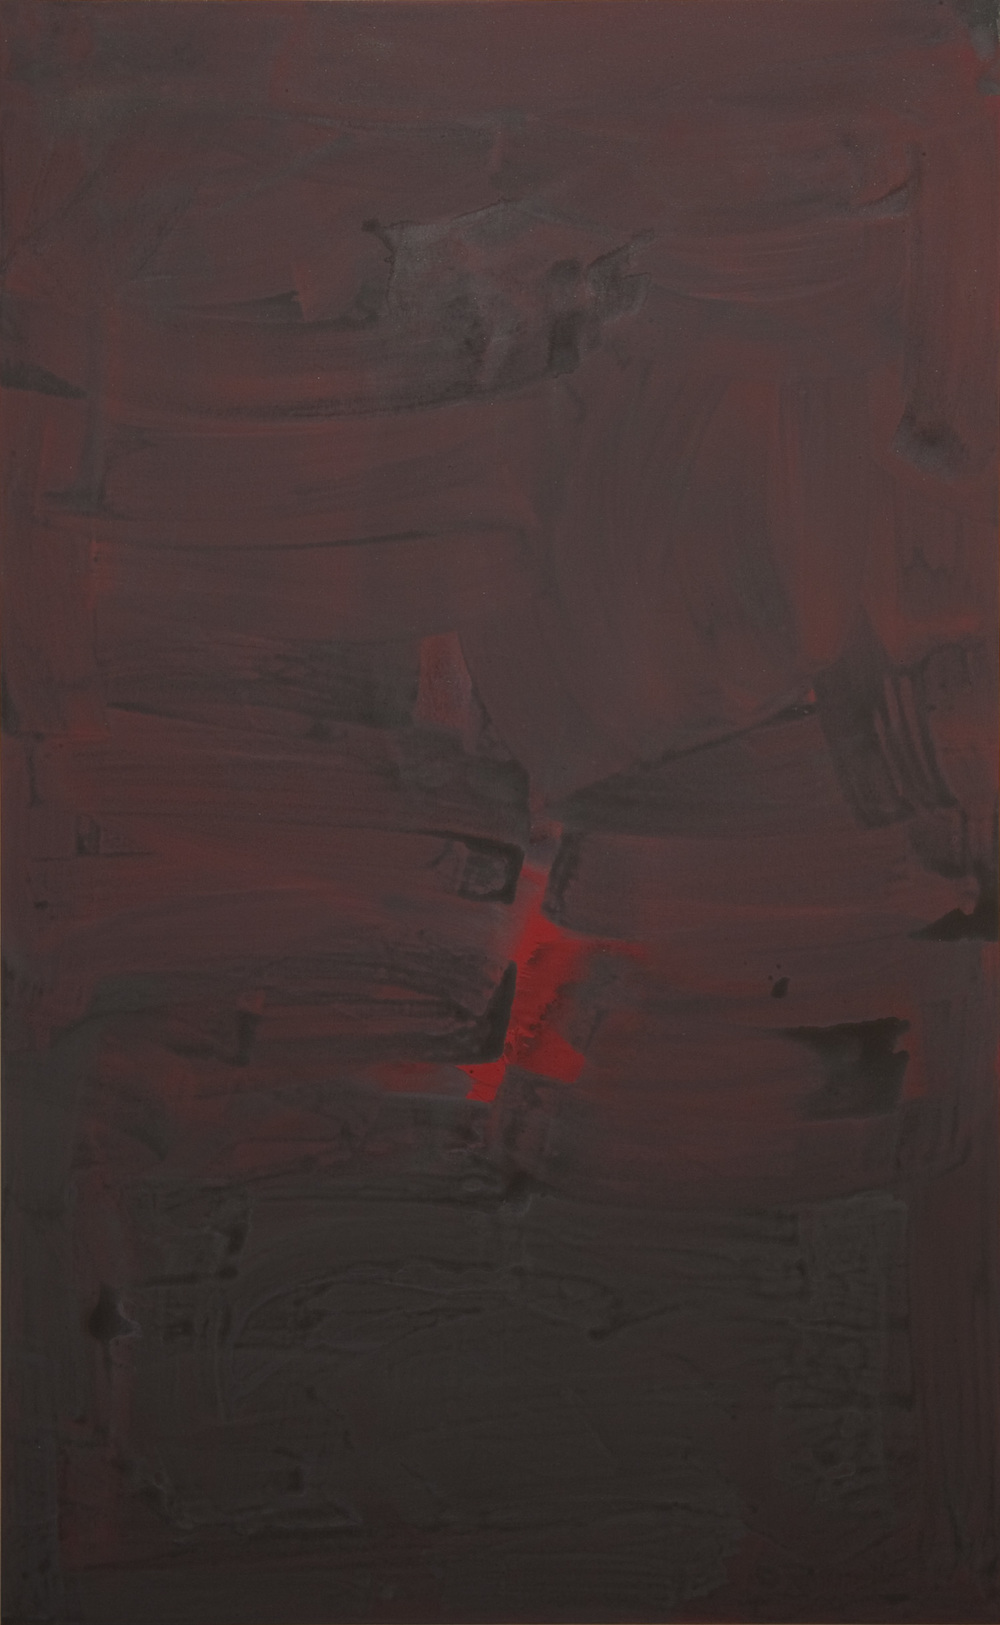 2012, acrylic on canvas,150 x 242.5 cm (59 x 95 1/2 in)